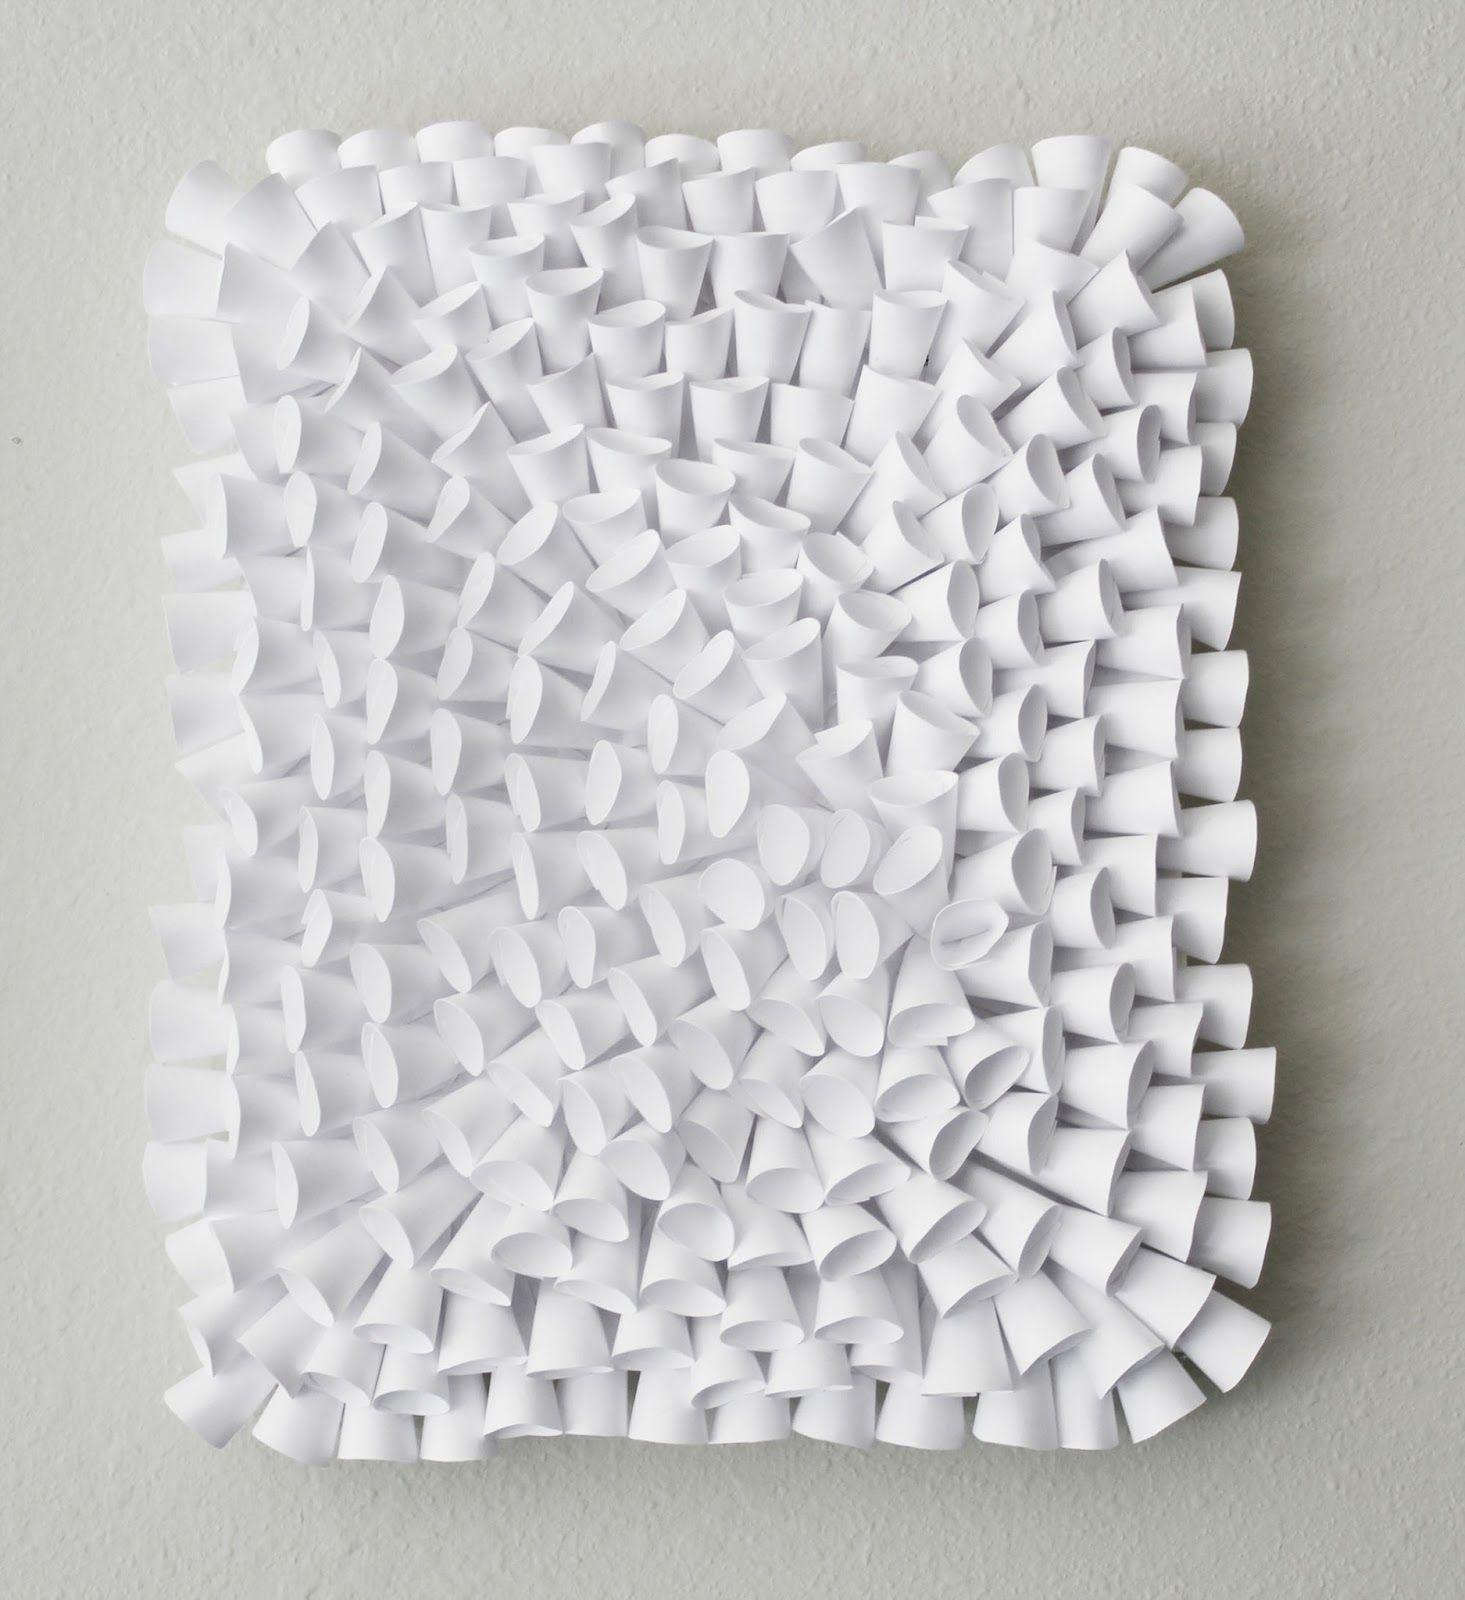 ₪ Paper Art Potpourri ₪ Momichka: White Paper Sculpture - CORAL ...